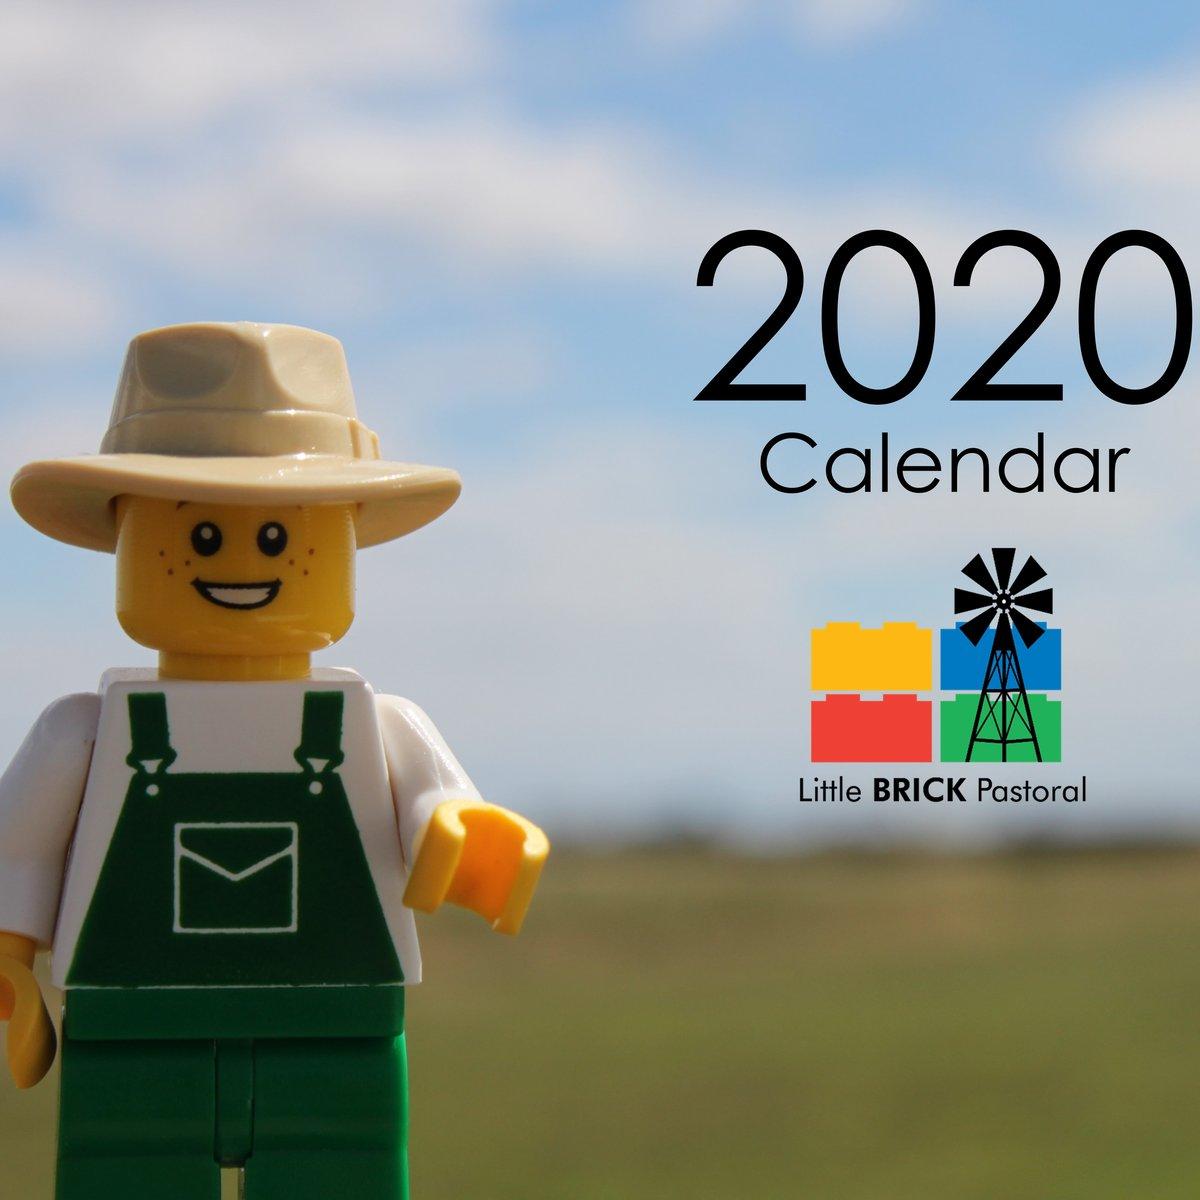 Image of 2020 Calendar